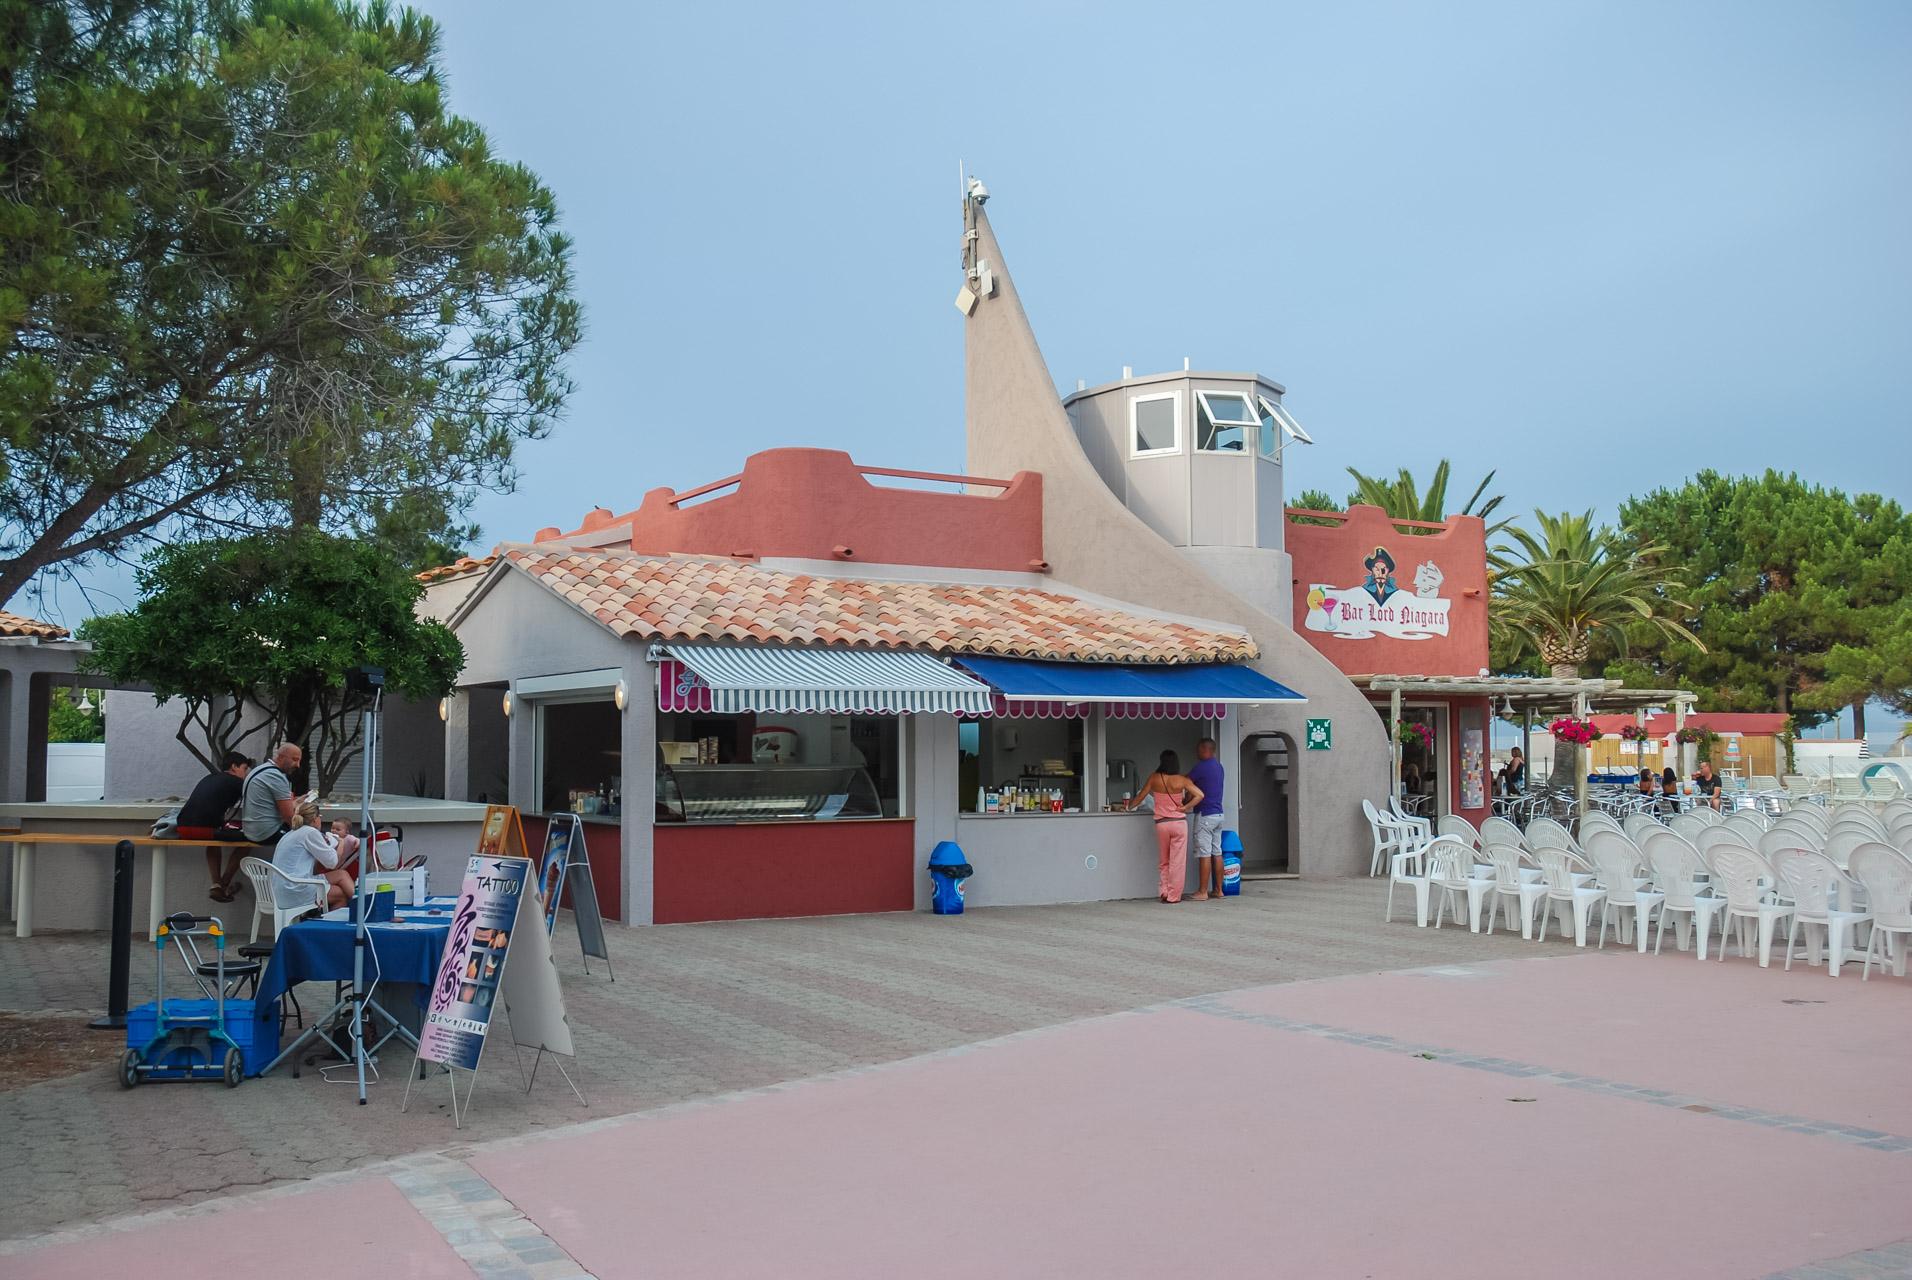 Camping Marina d'Erba Rossa